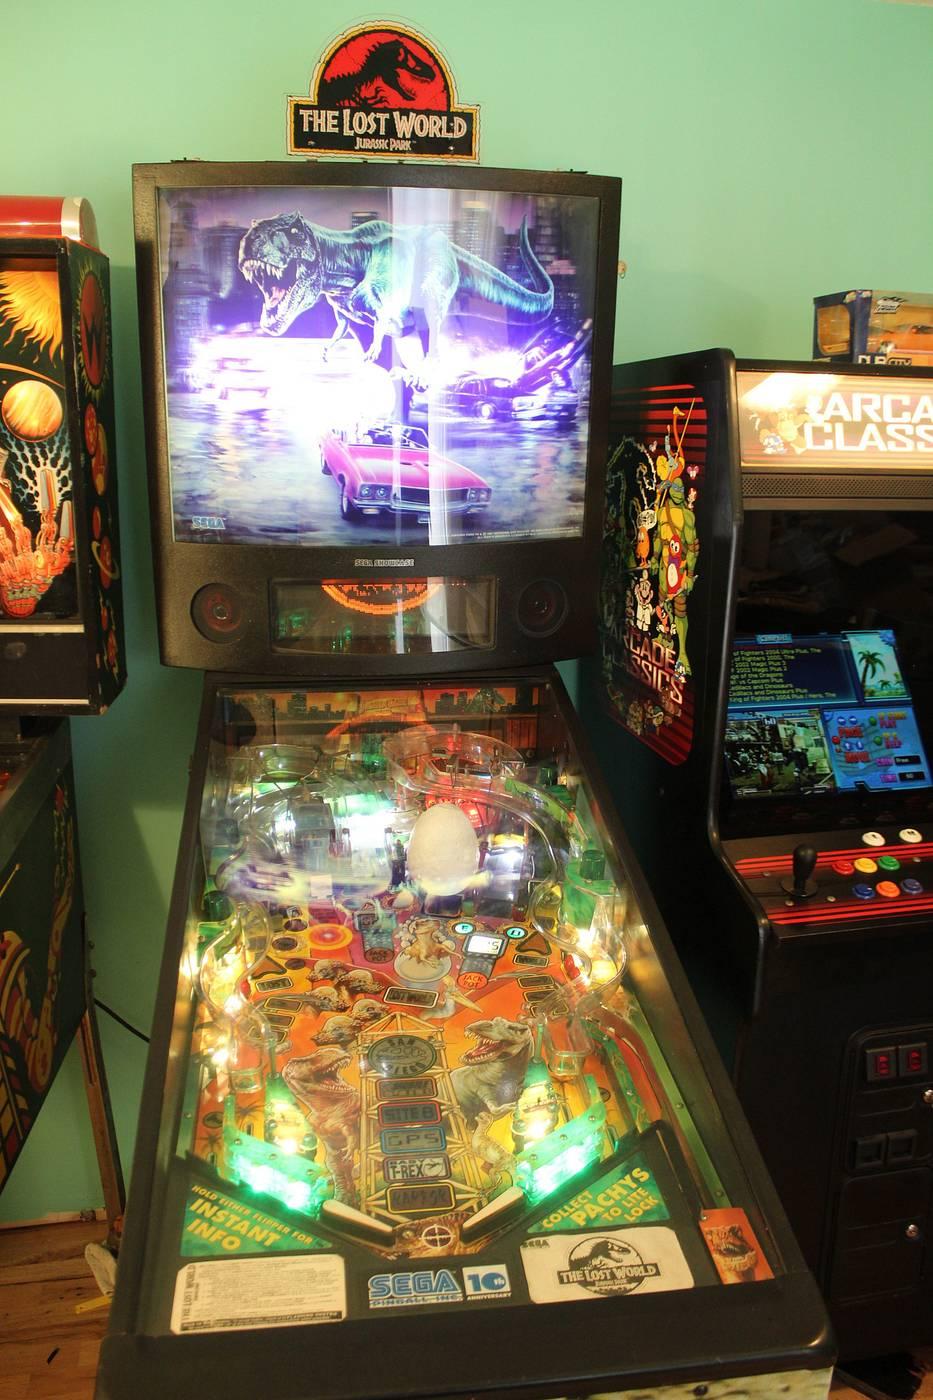 lost world pinball machine for sale